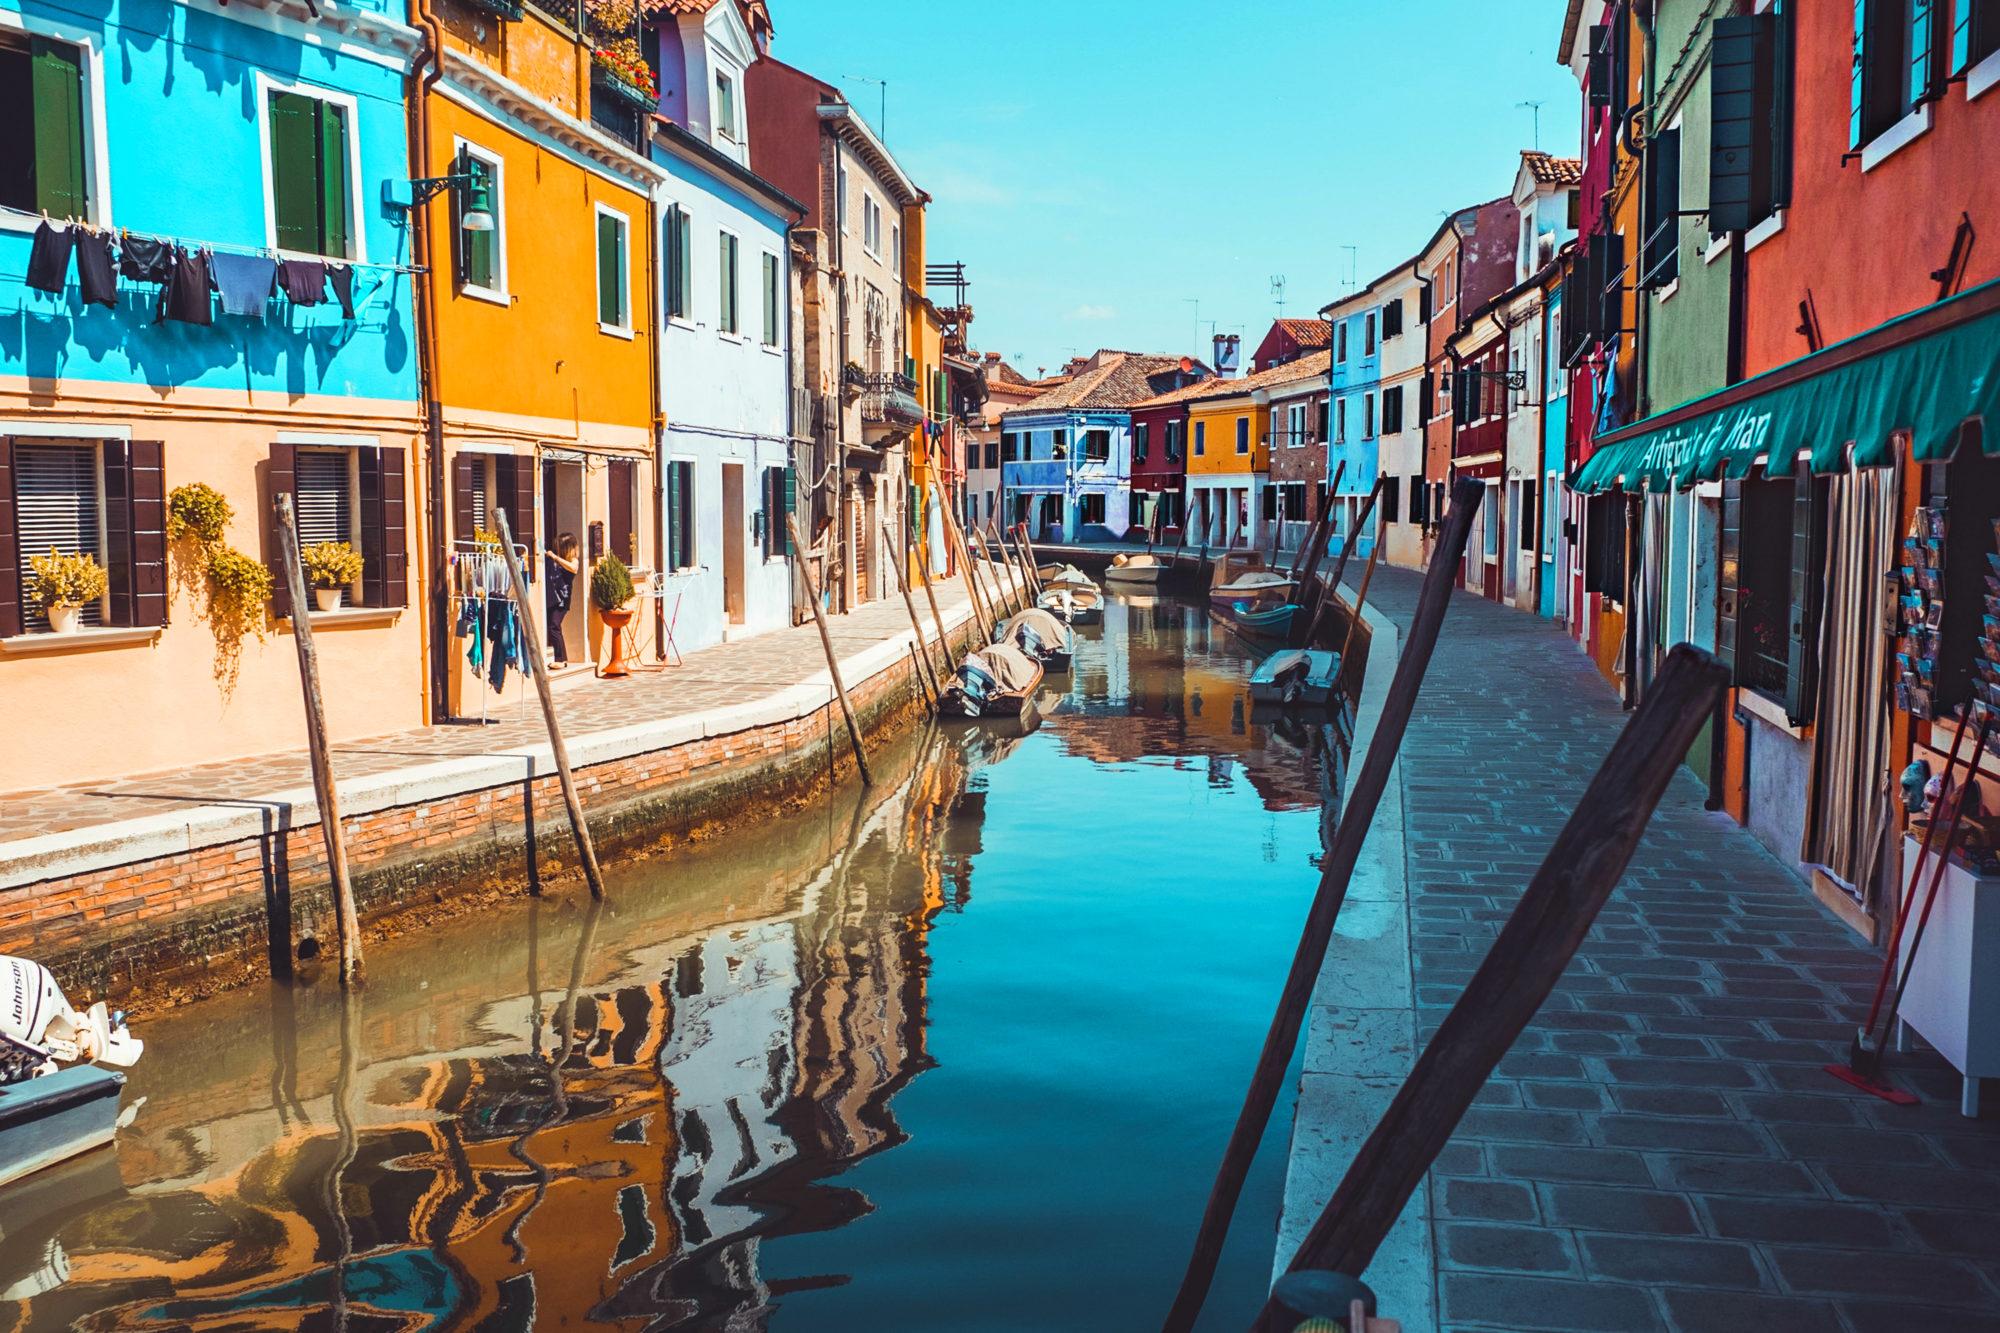 Burano, Venice in Italy